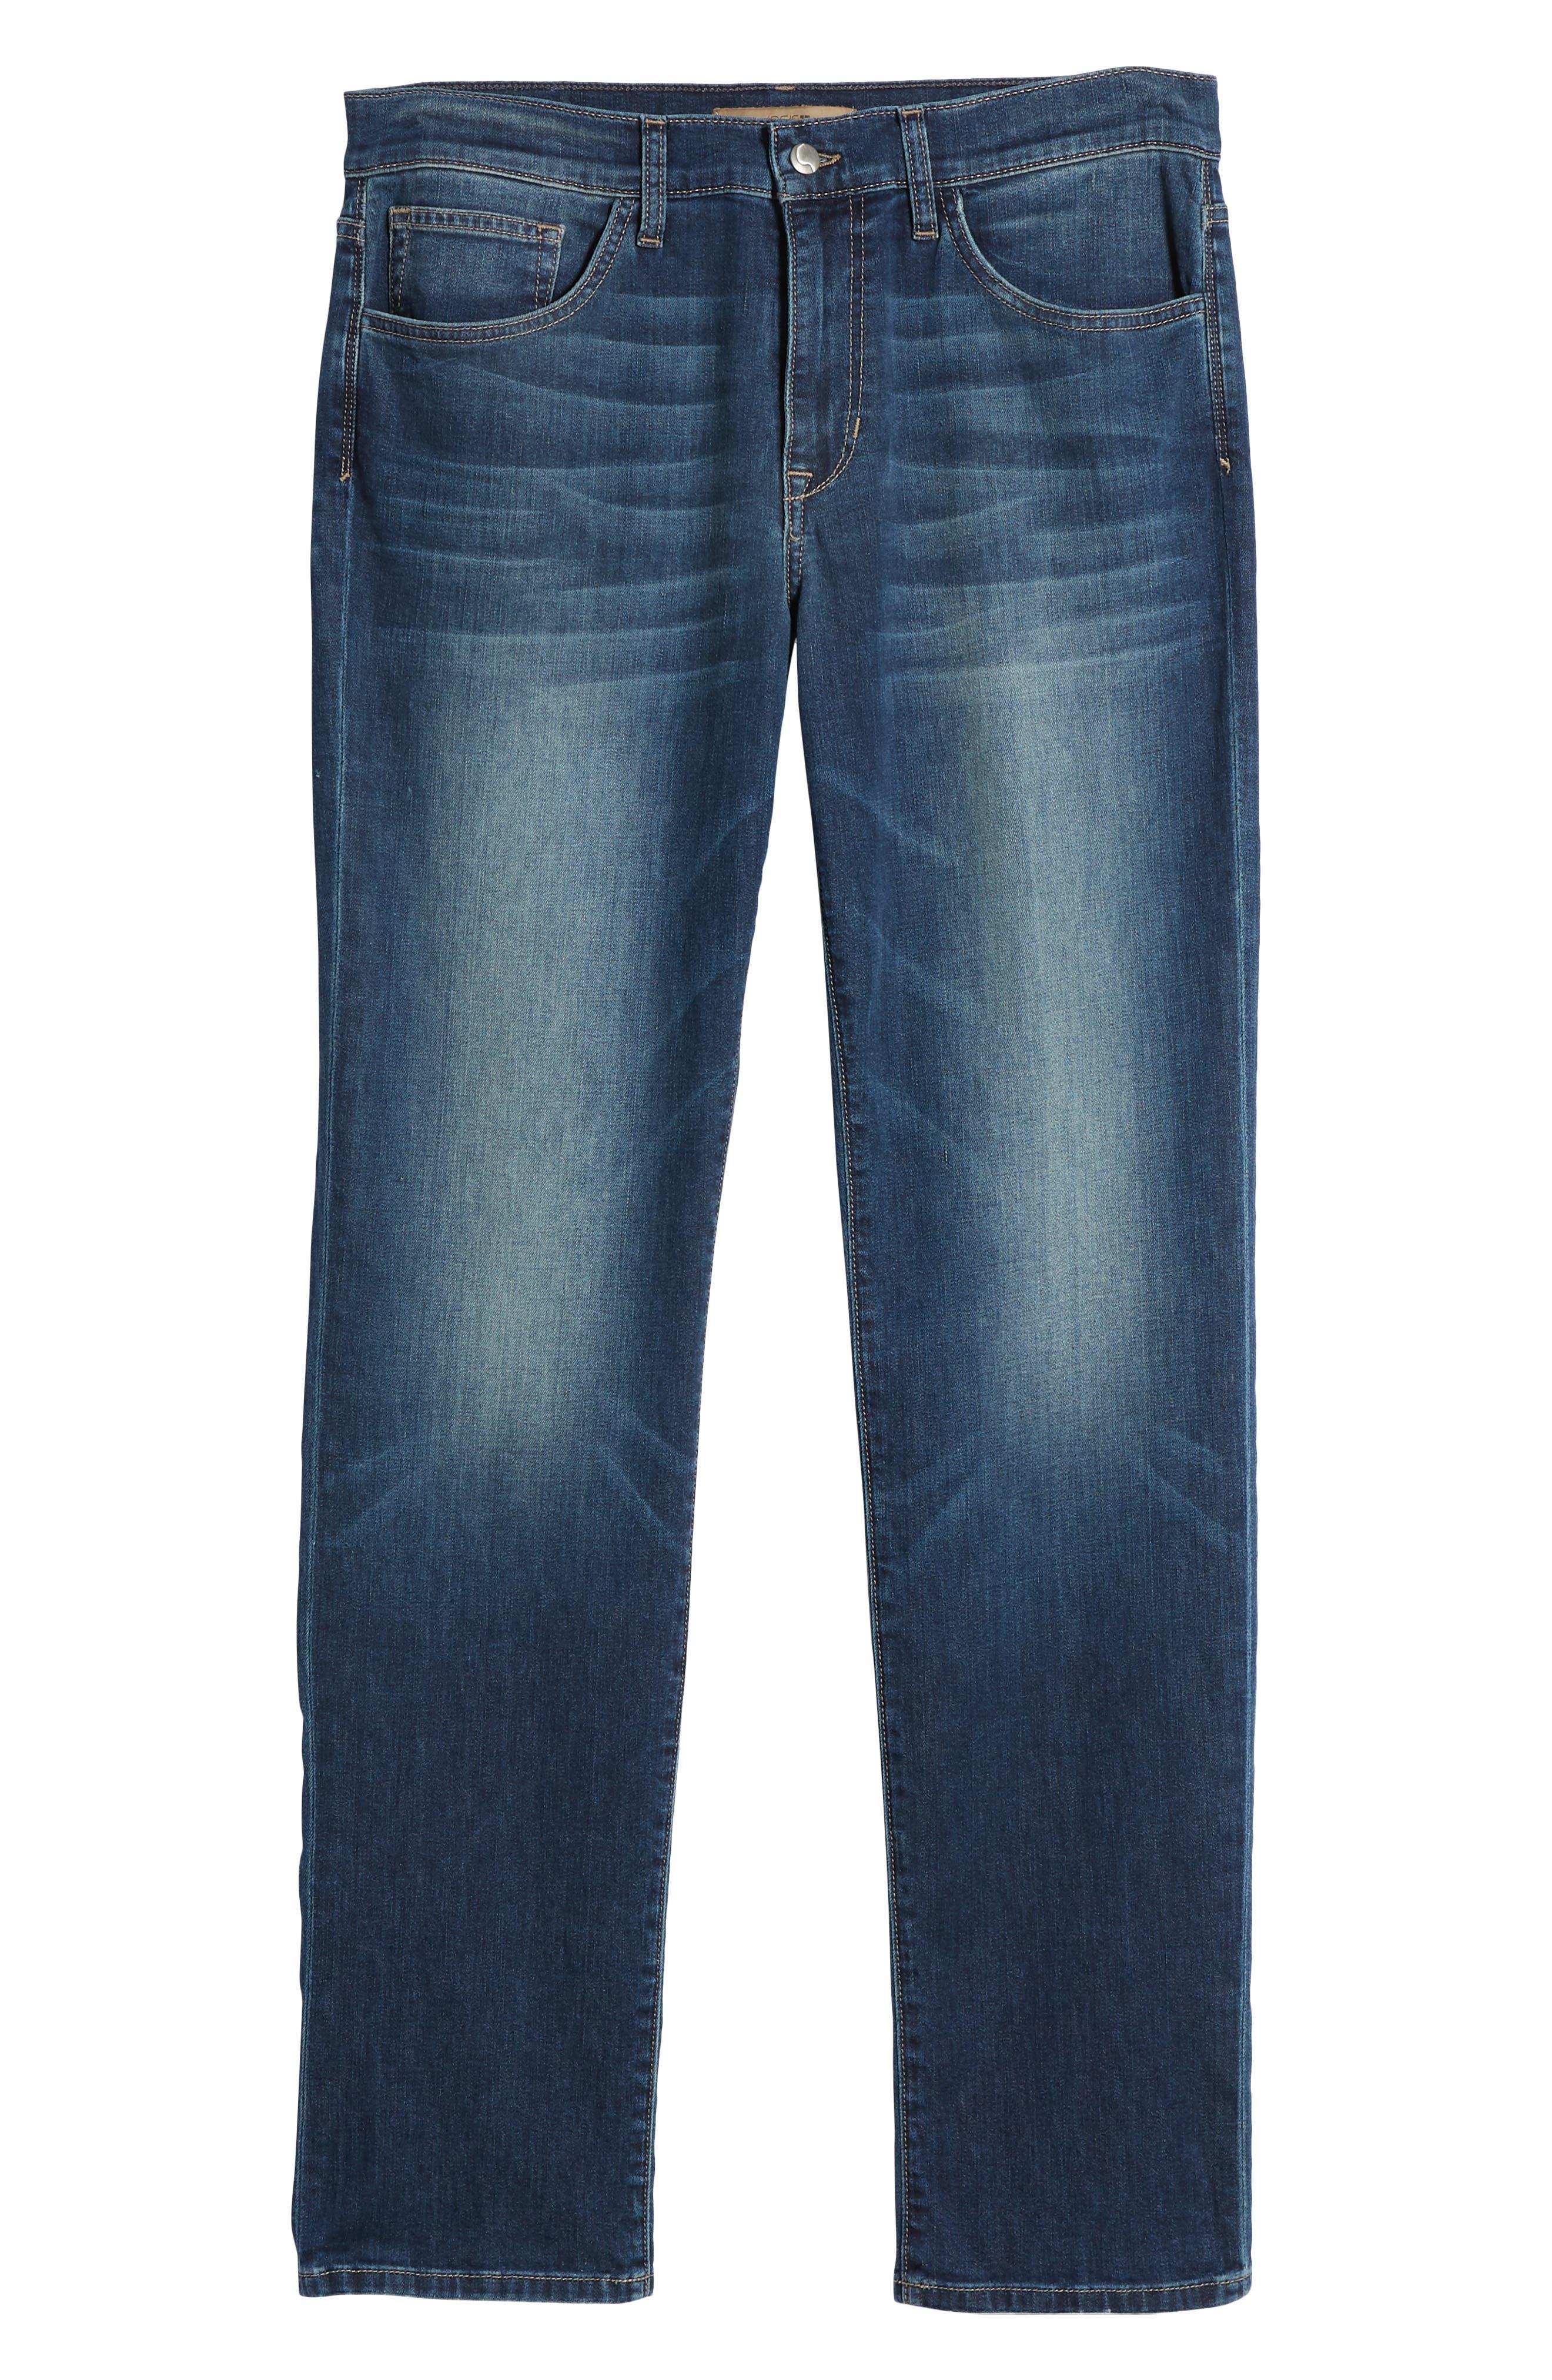 Brixton Slim Straight Fit Jeans,                             Alternate thumbnail 6, color,                             400